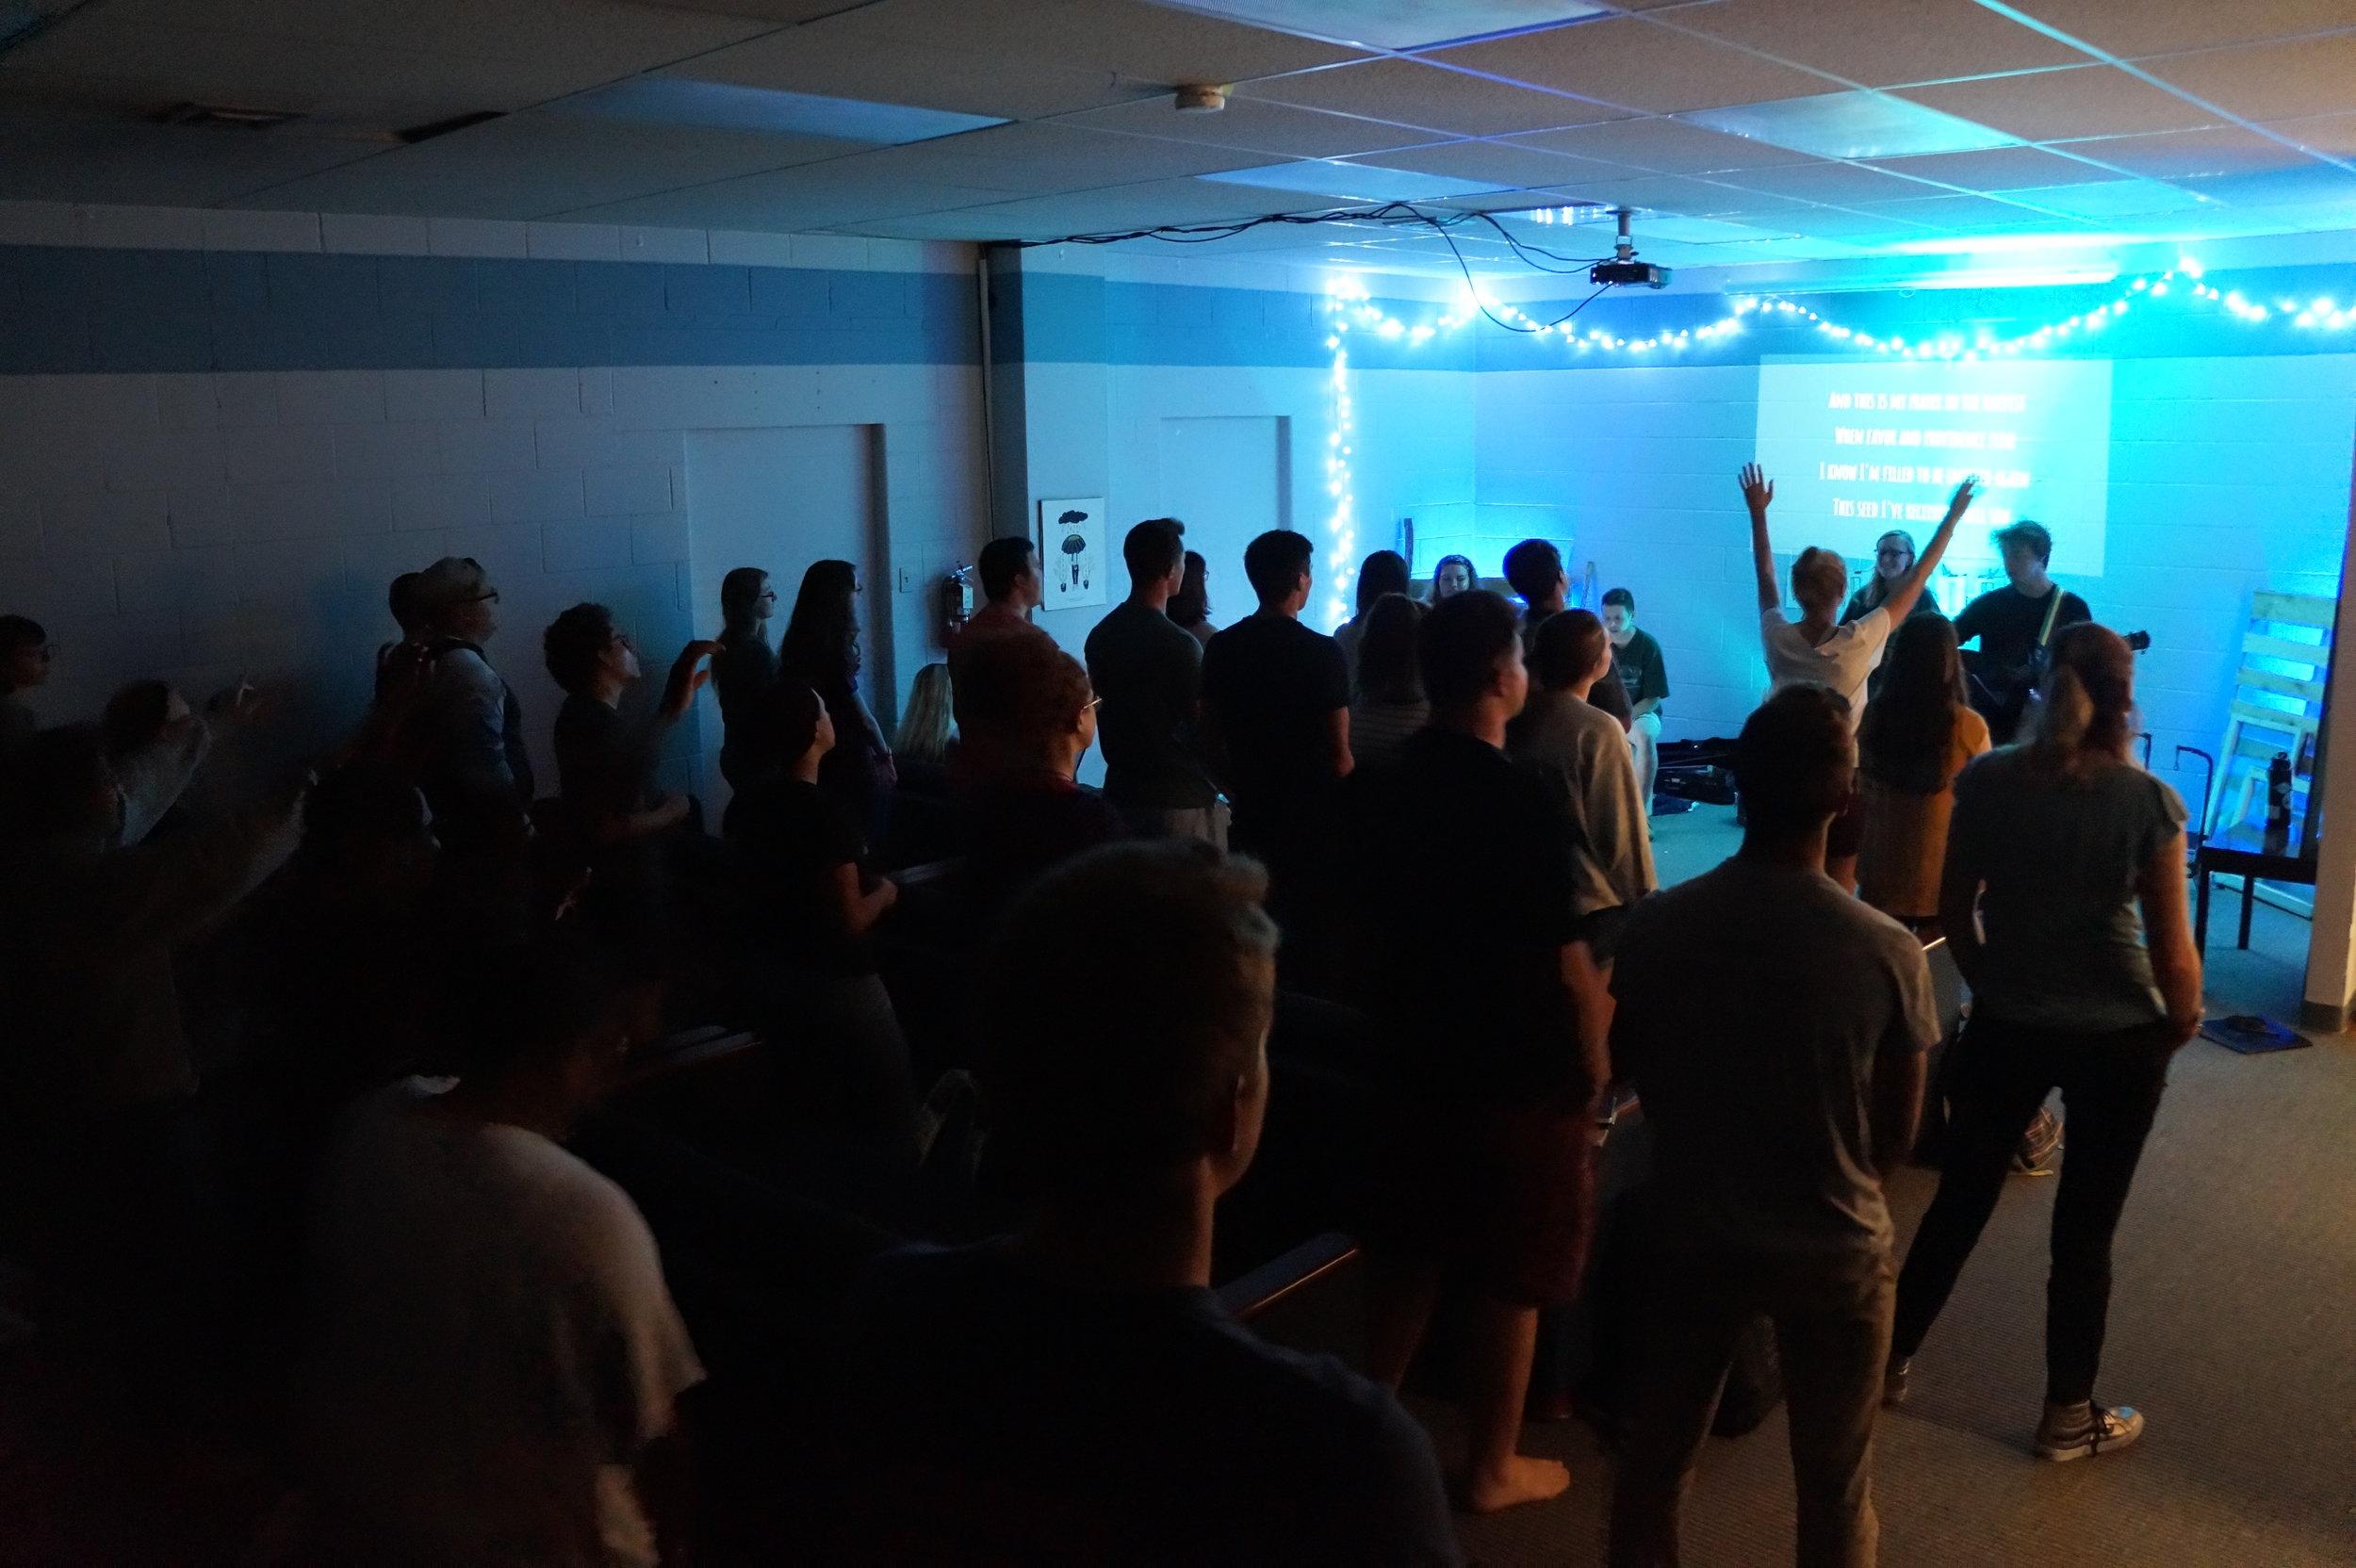 Monday night worship